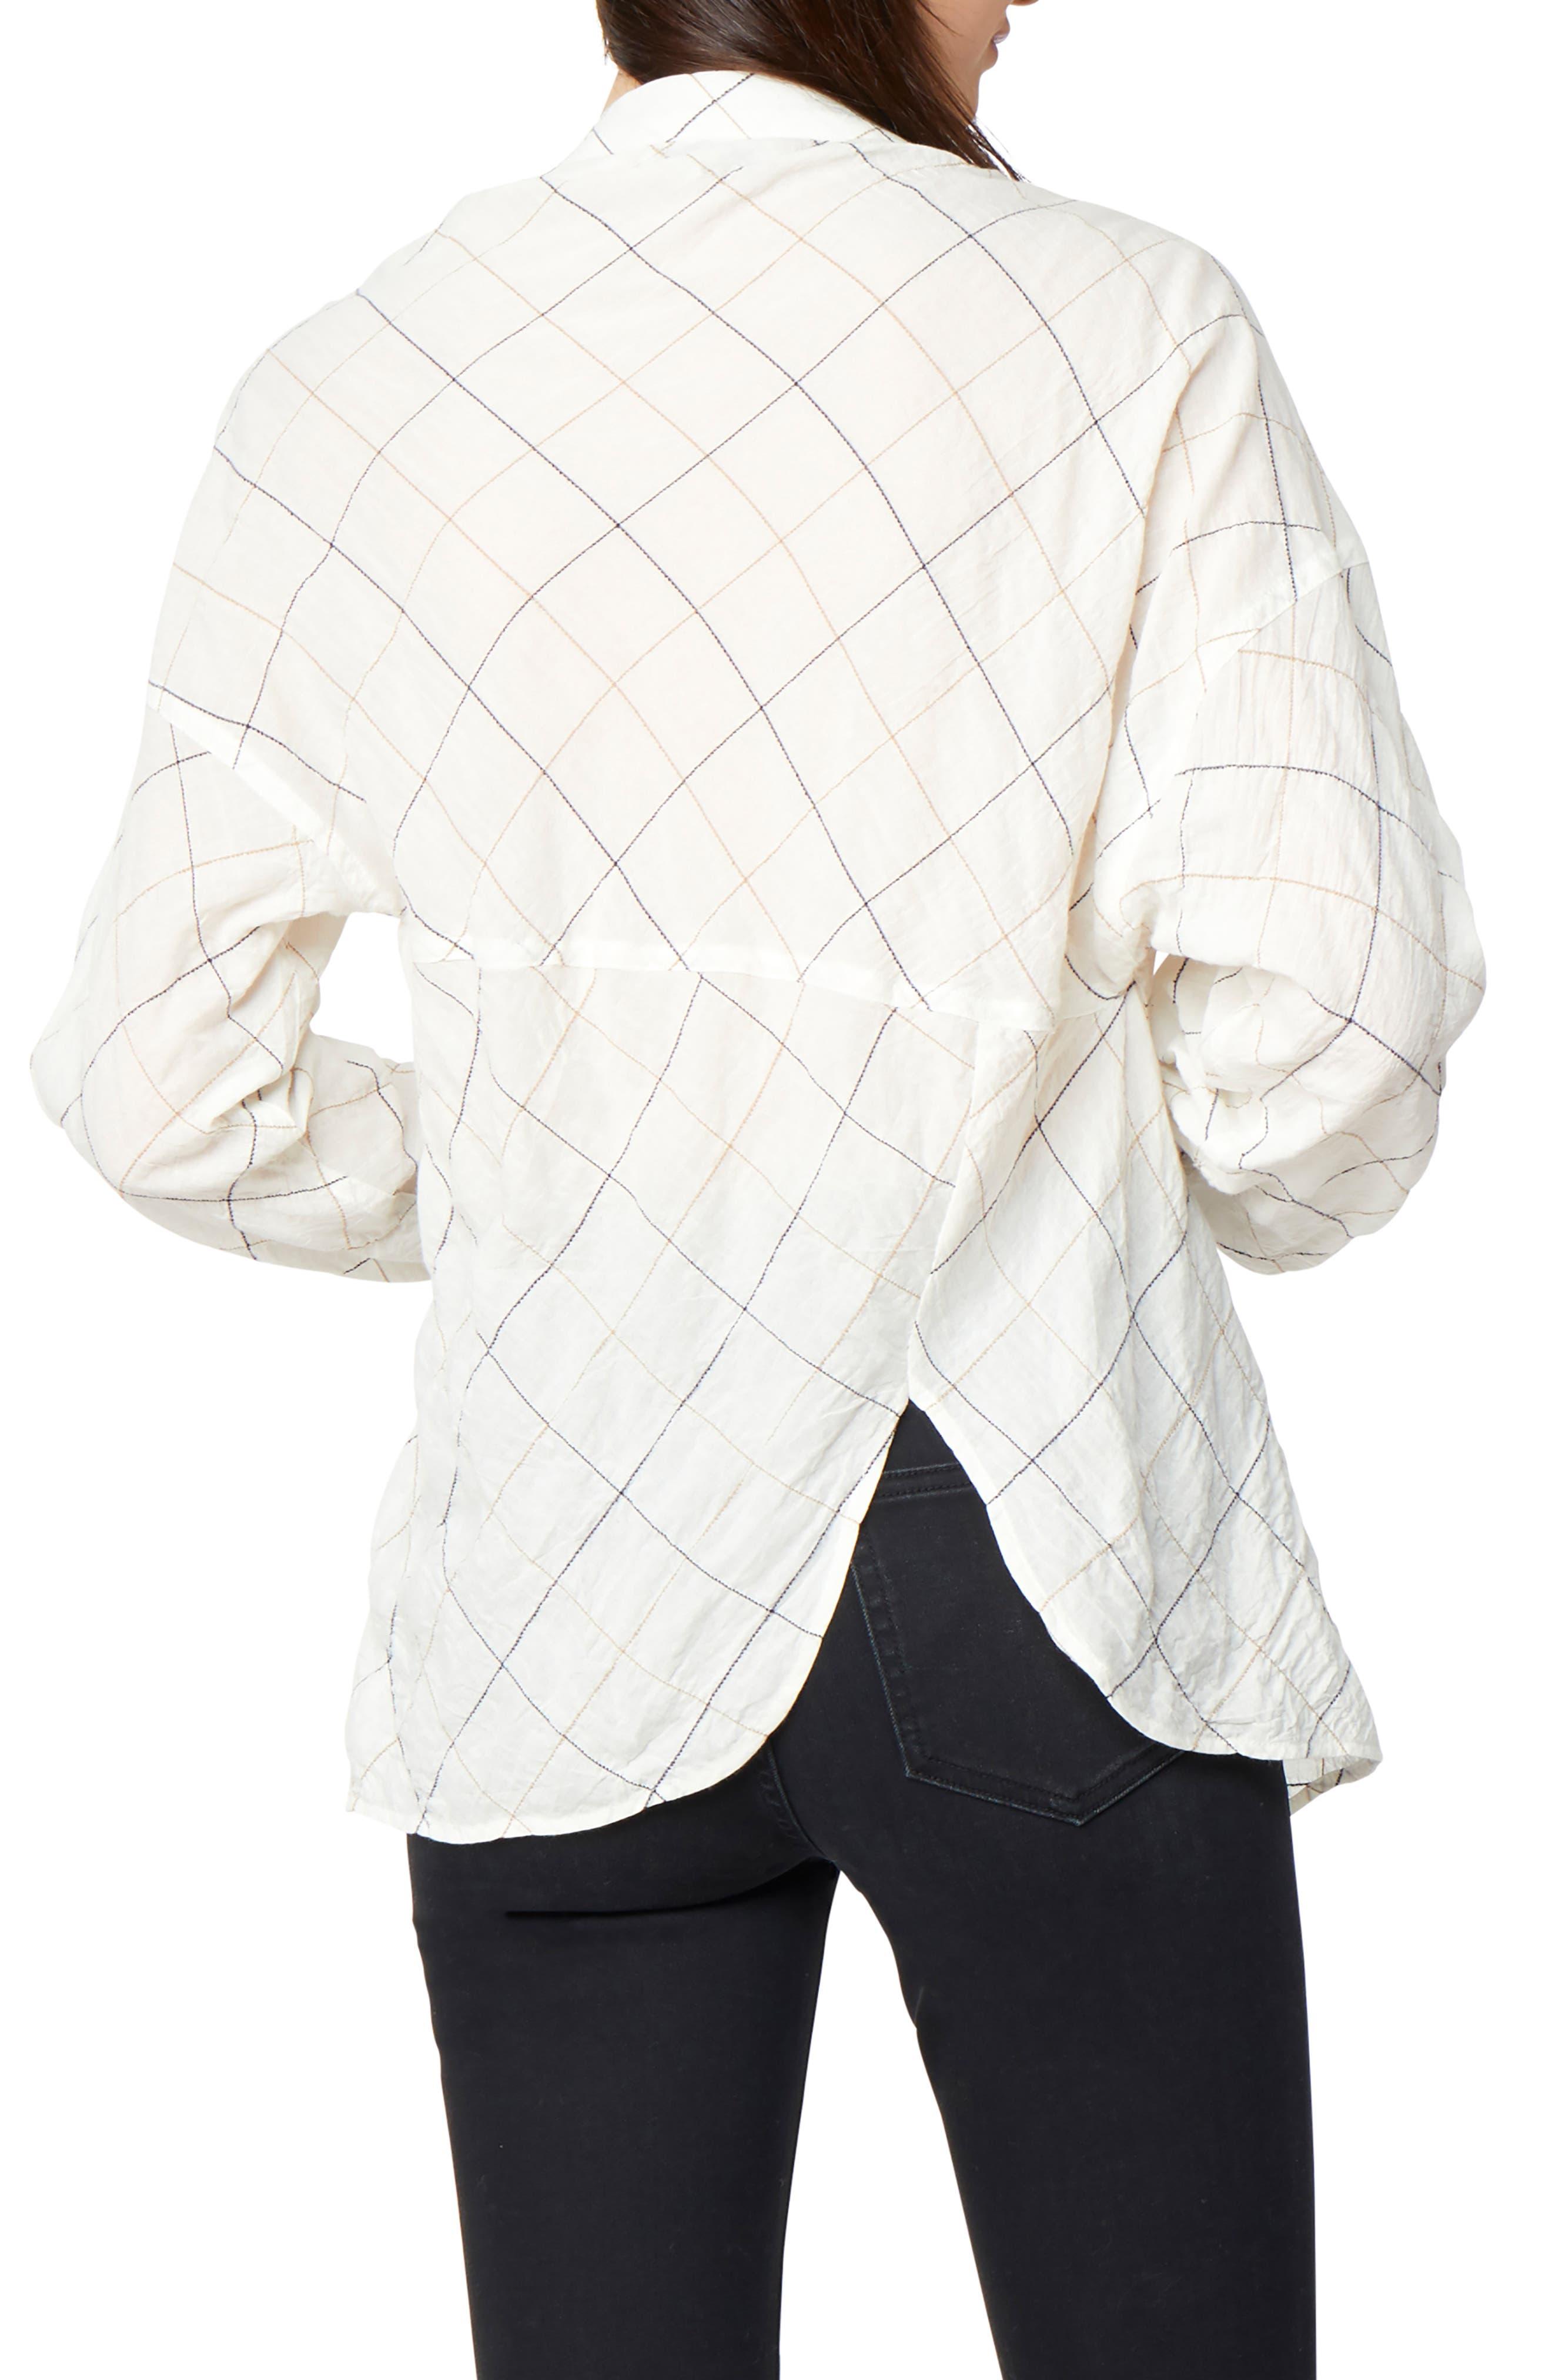 Daphne One Shoulder Cotton Top,                             Alternate thumbnail 2, color,                             White Whisper